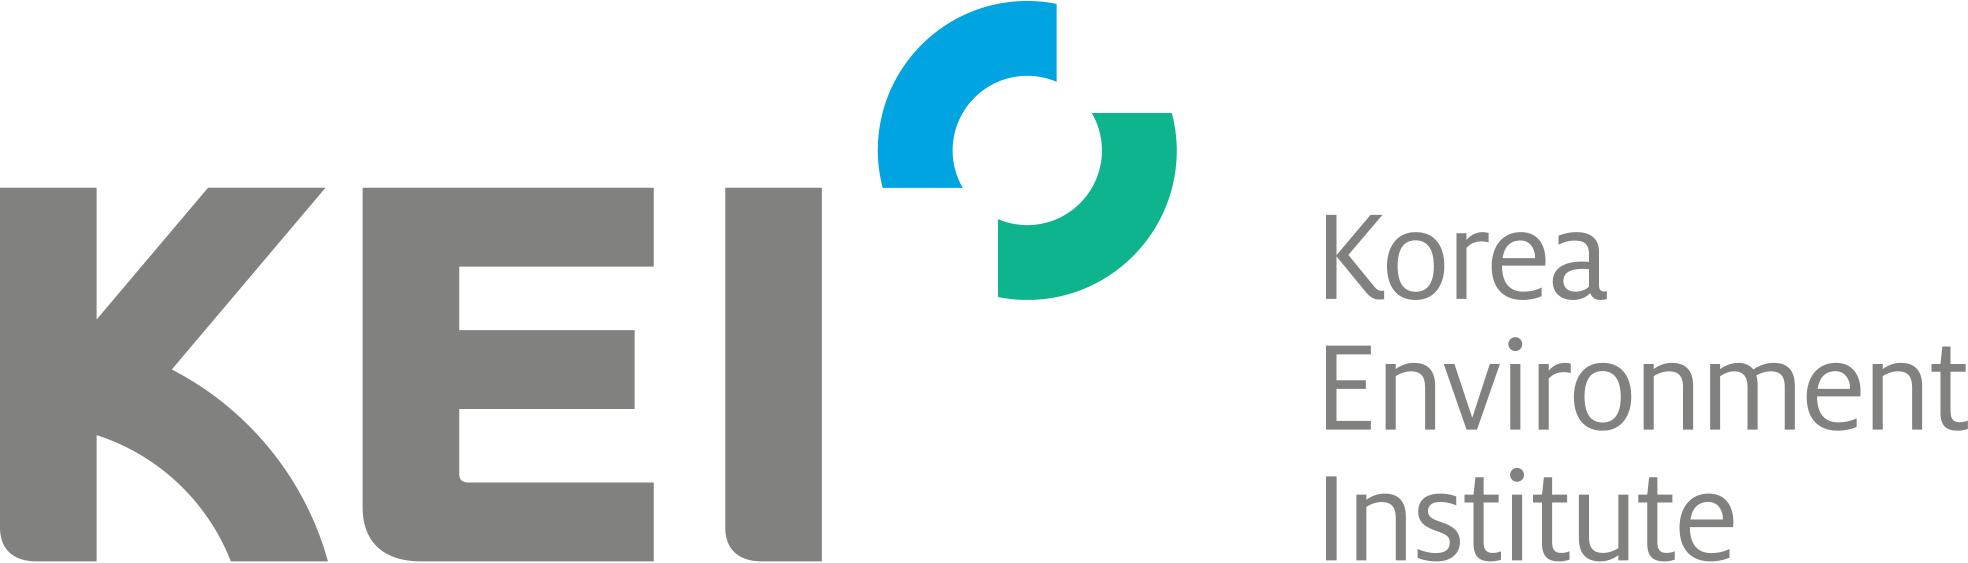 KEI_logo_English_2